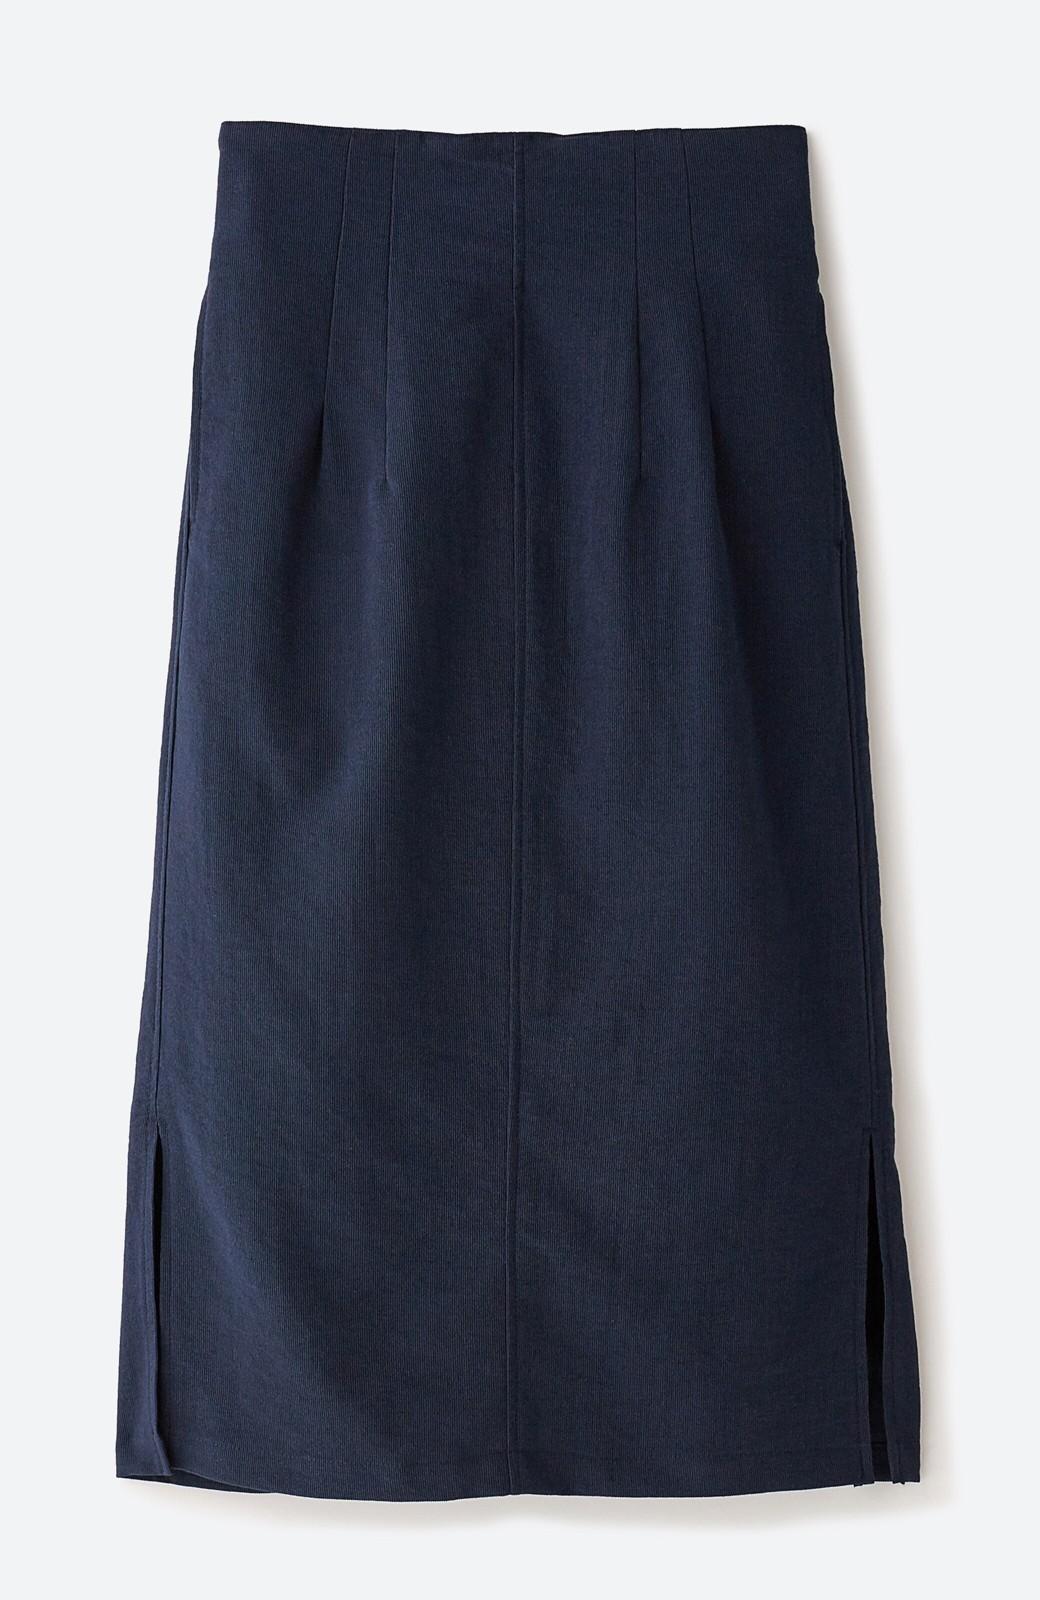 haco!  腹巻きとは呼ばせない ブルー期も華やかに過ごせる消臭加工裏地付きフリルデザインスカートセット【ブルー期】女の子バンザイ!プロジェクト <ネイビー>の商品写真3